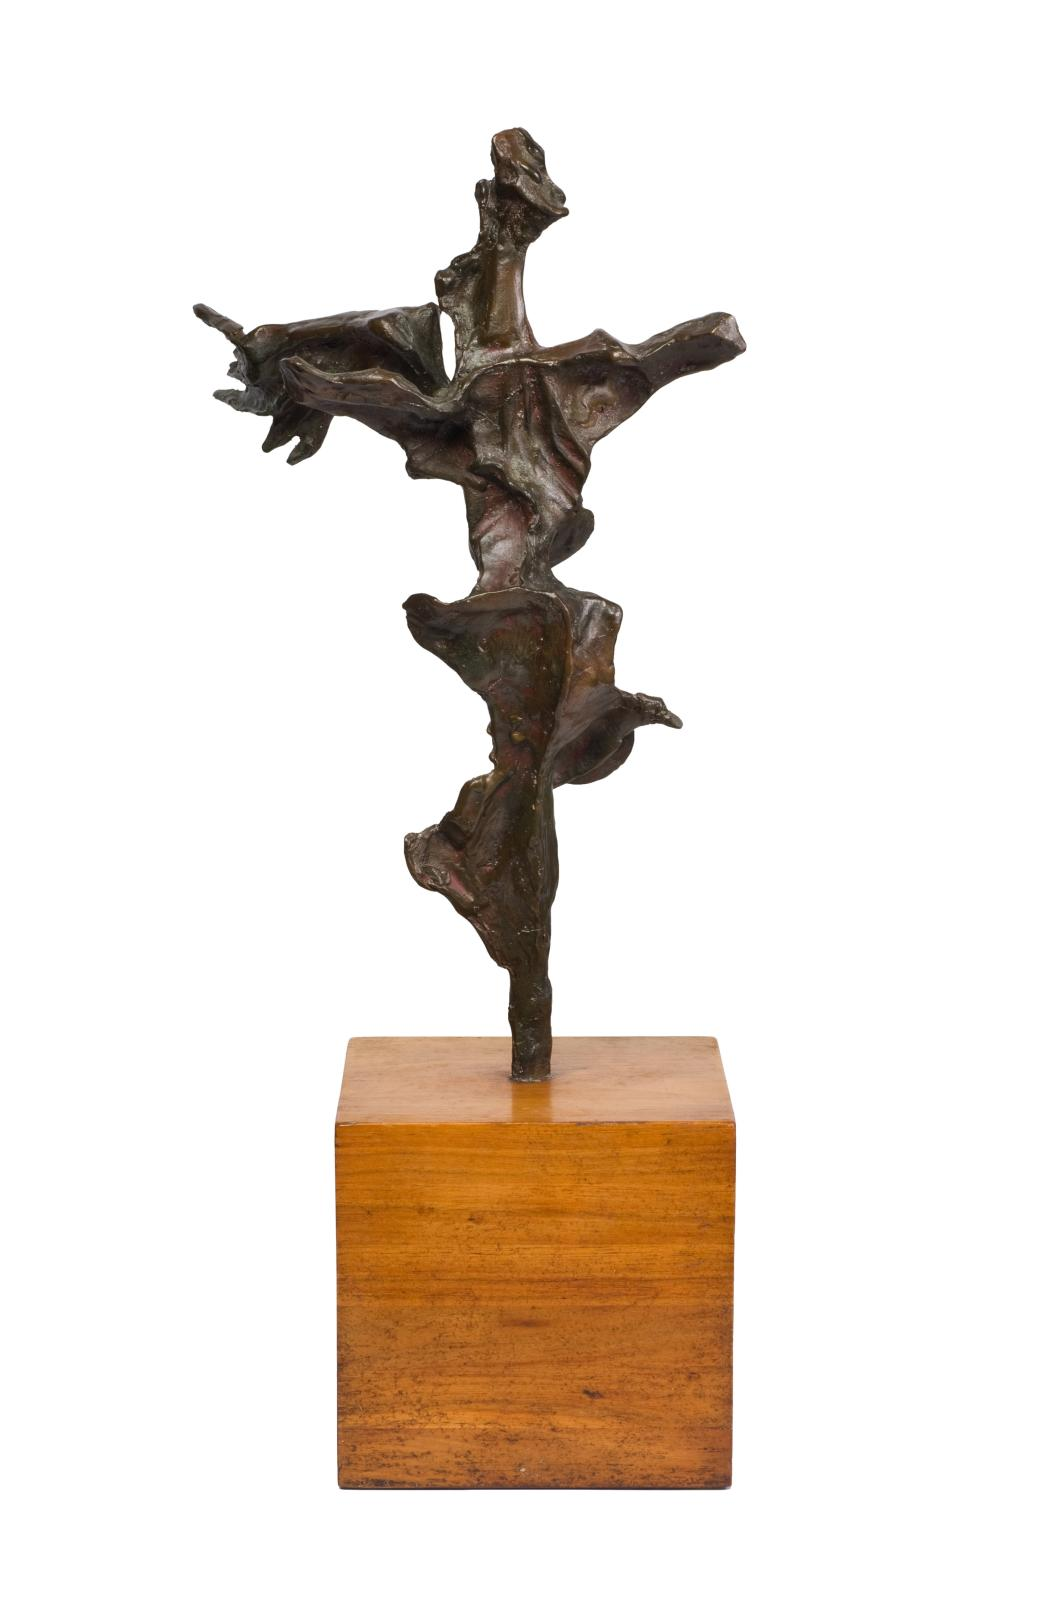 An abstract bronze sculpture representing a figure